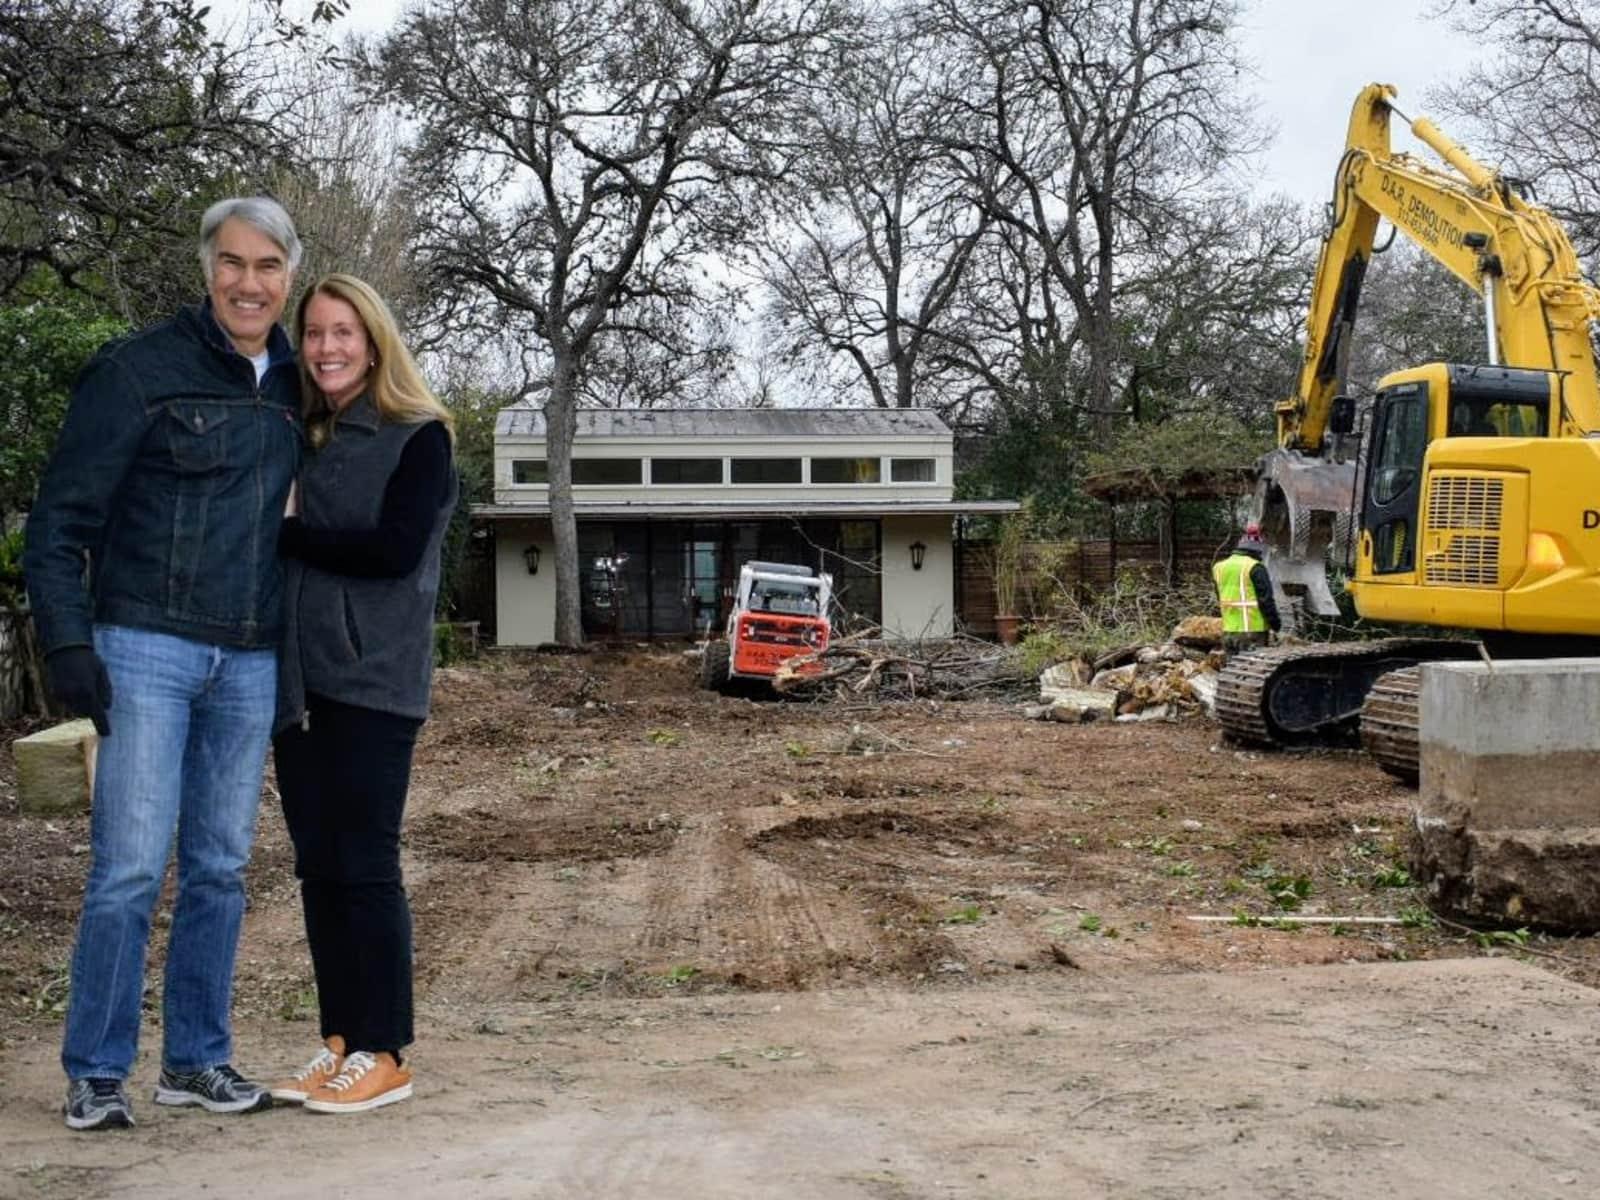 Thomas & Yvonne from Austin, Texas, United States